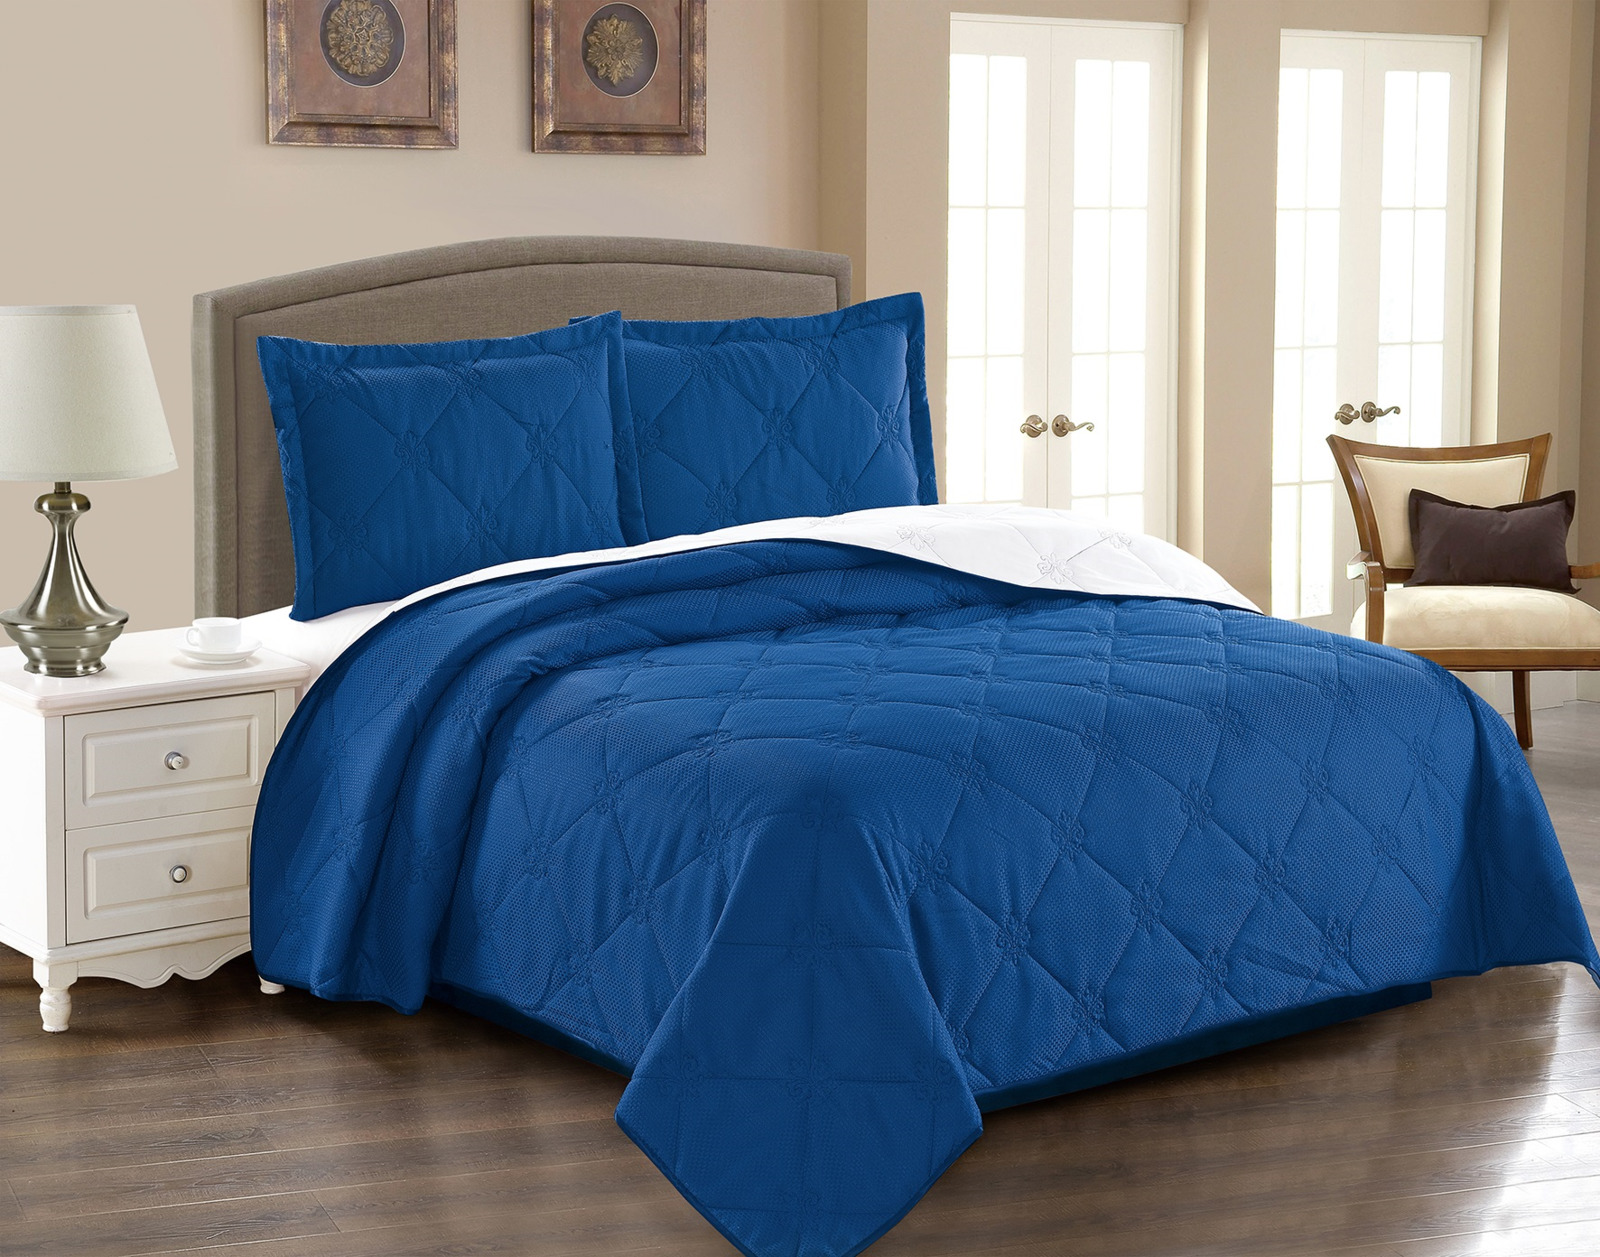 Покрывало с наволочками Cleo Runa, 220/005-RA, синий, 220 х 240 см, наволочки 50х70+5